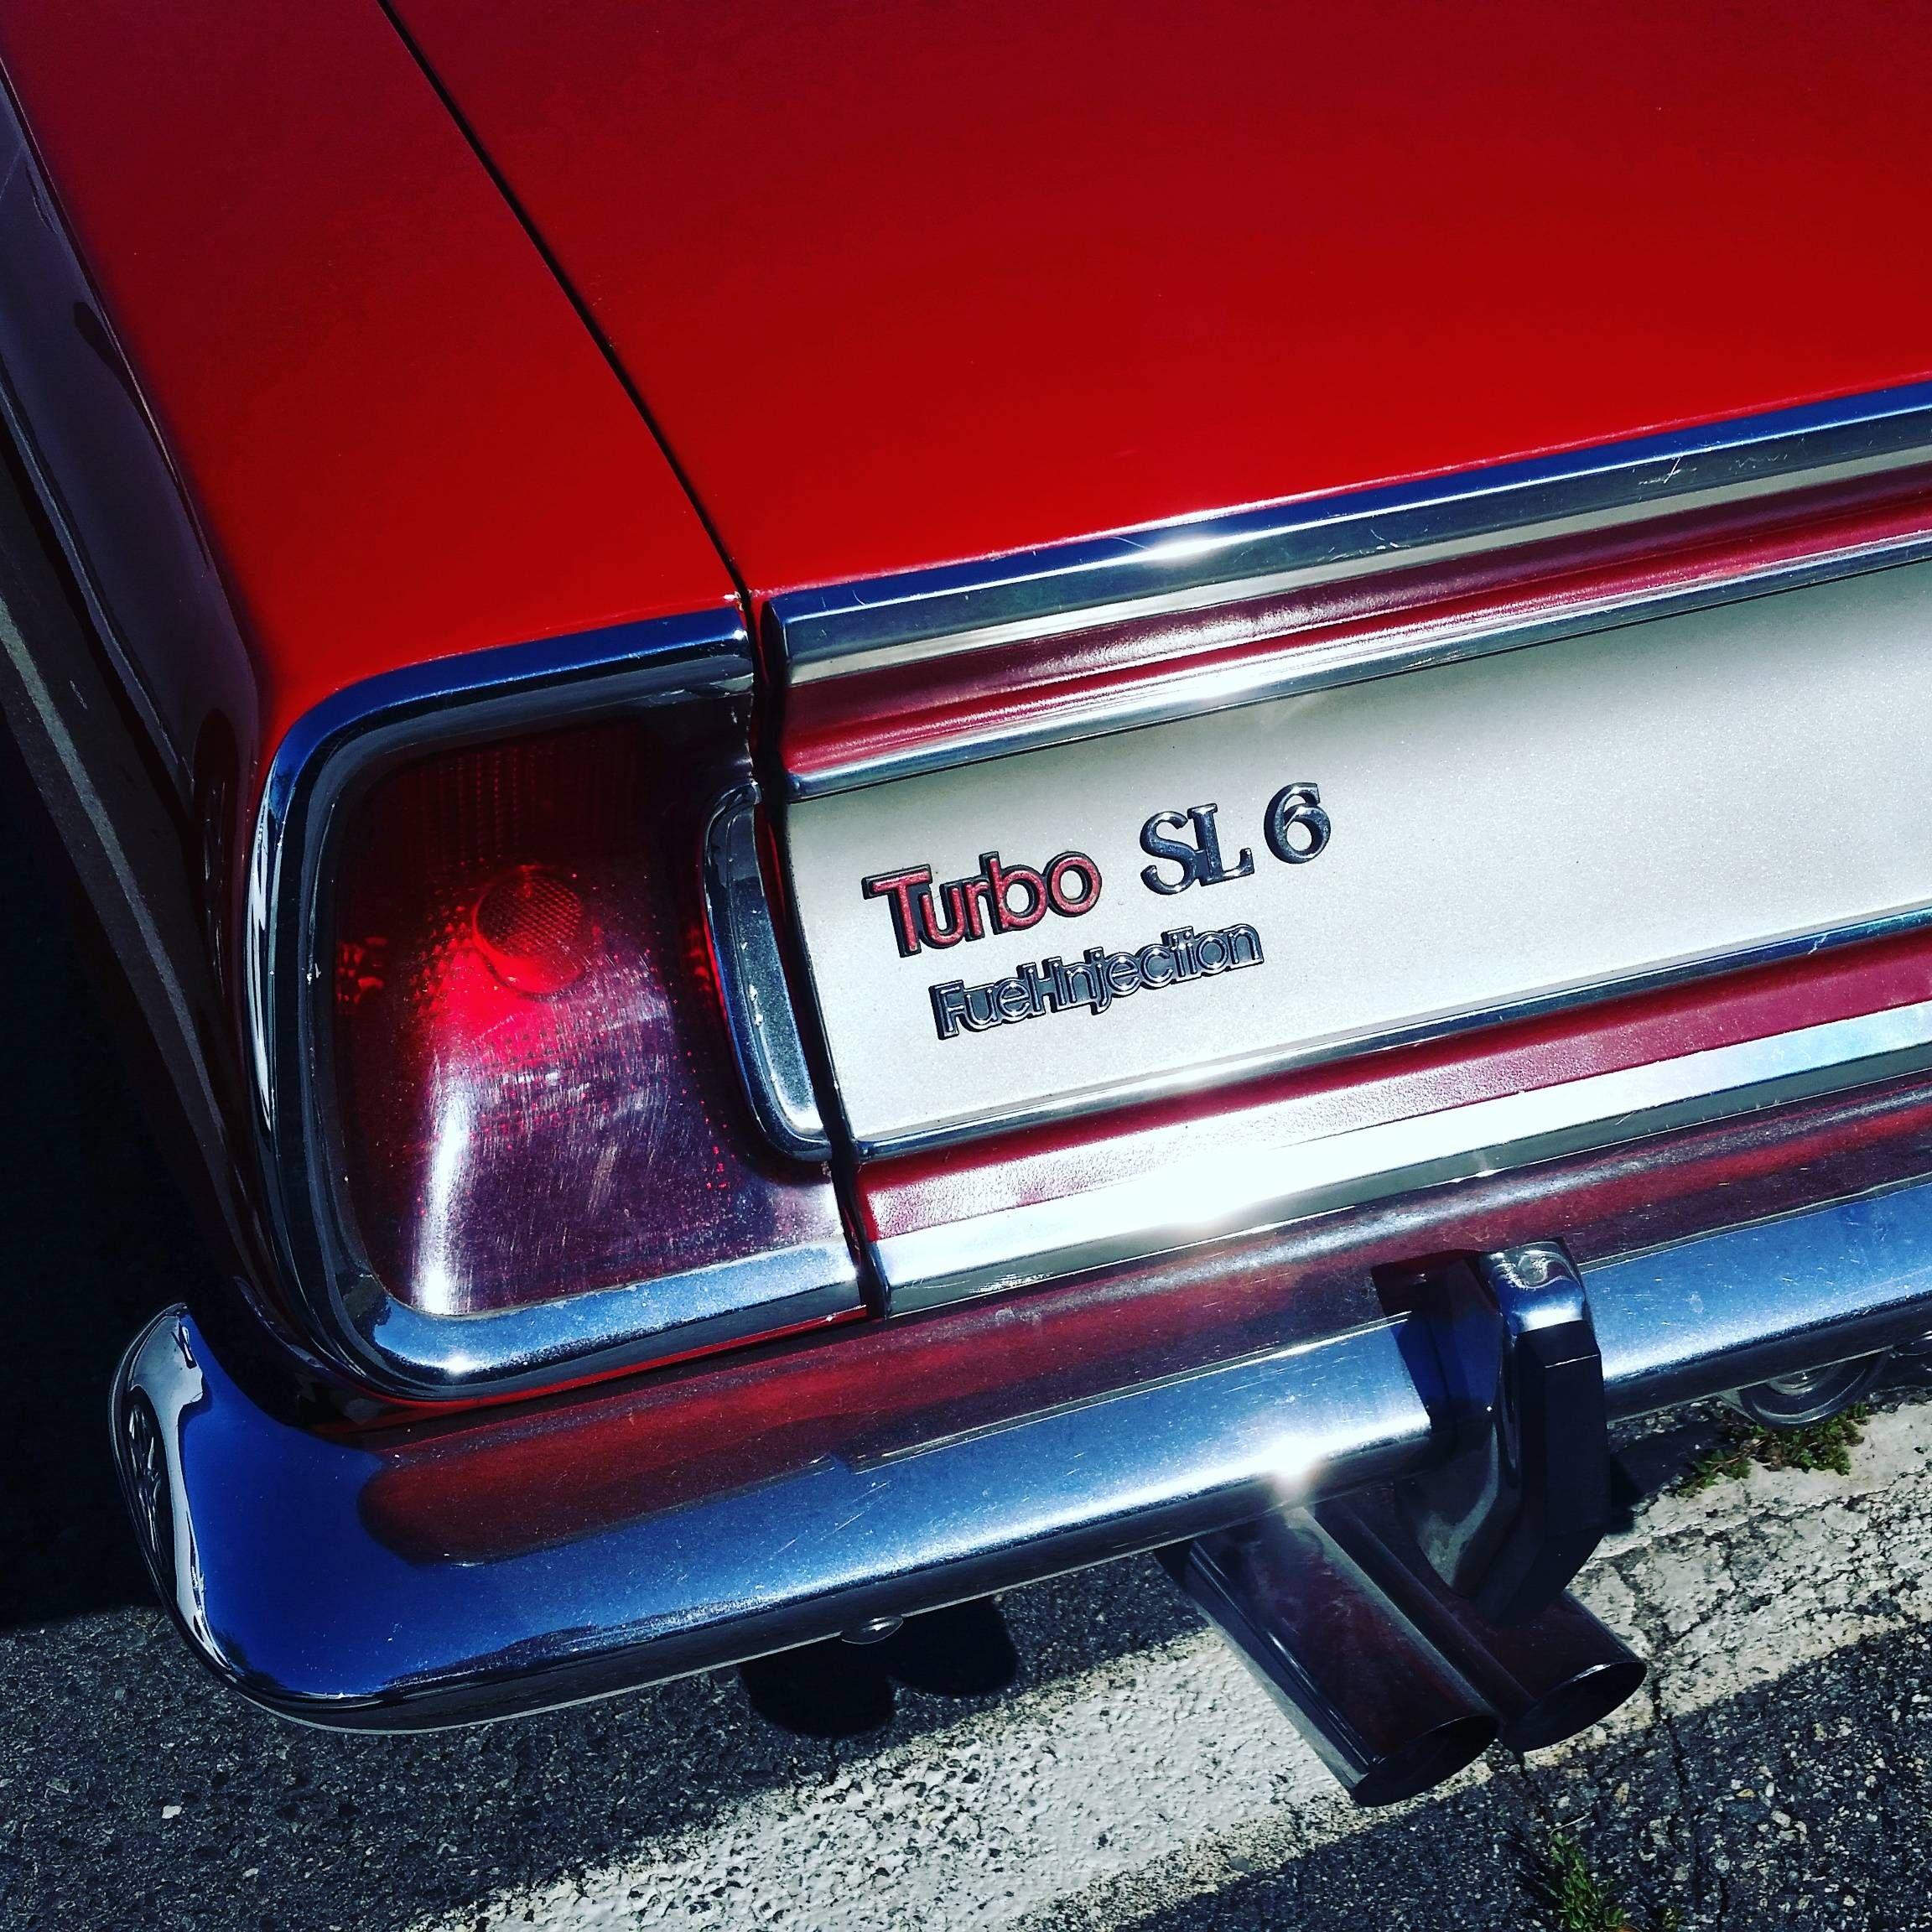 Turbo Slant Six Plymouth Barracuda